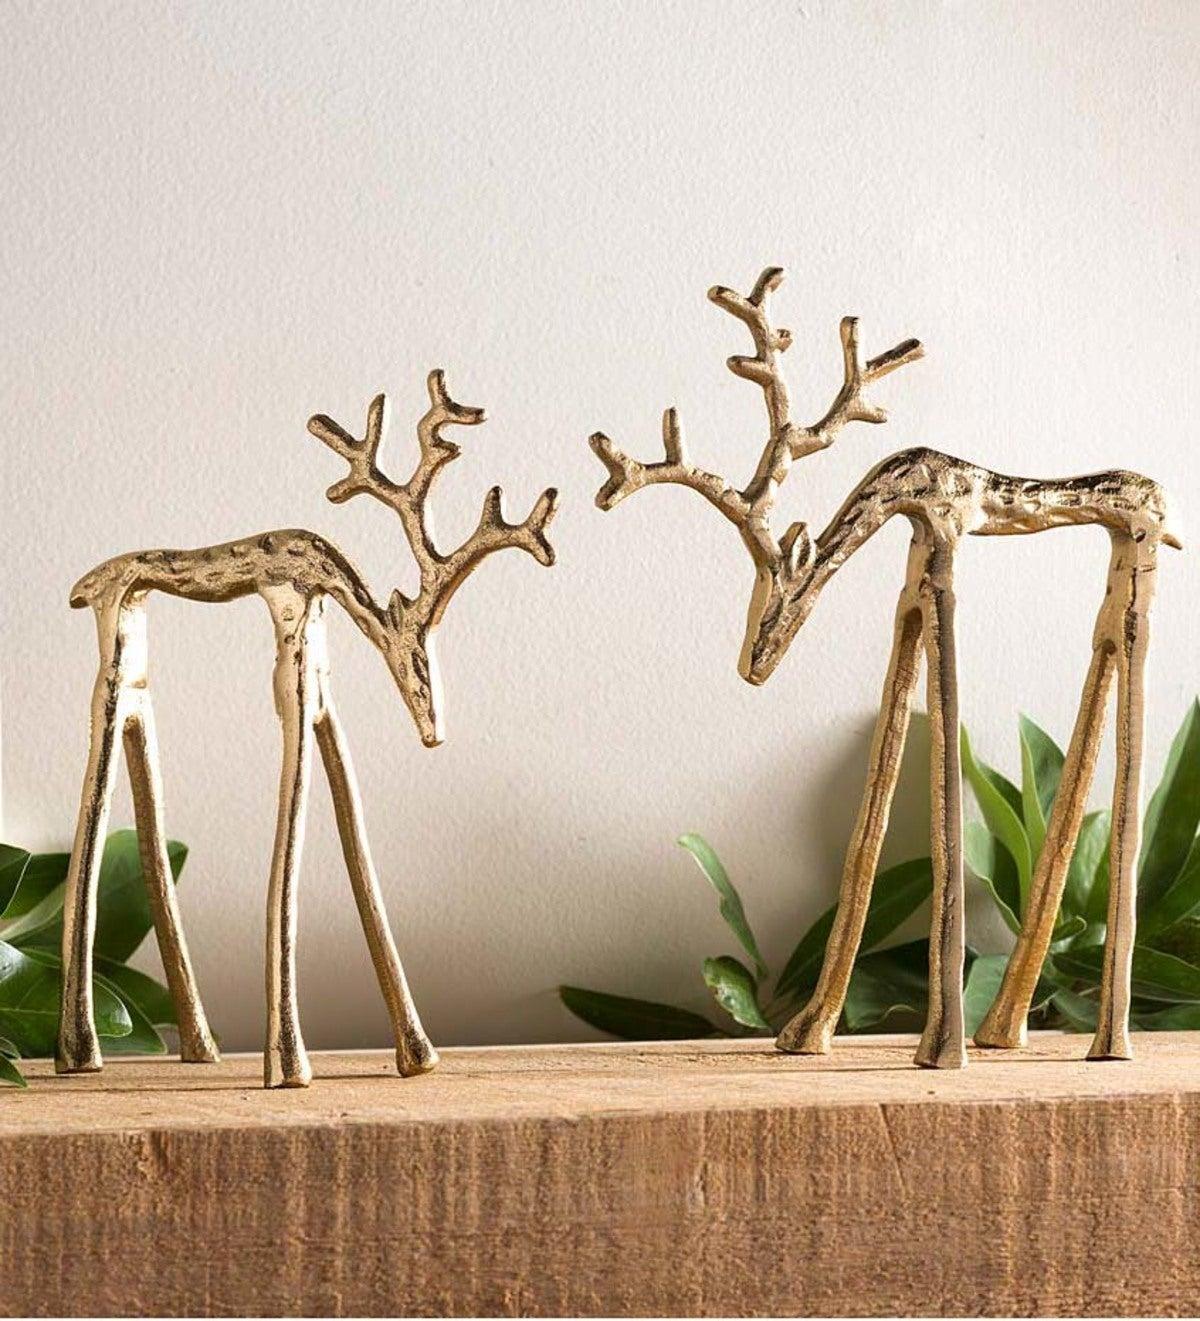 LOVE HANDLES Handmade Ring Tower Holder Tree Ceramic Dish Ornament for Home Decor